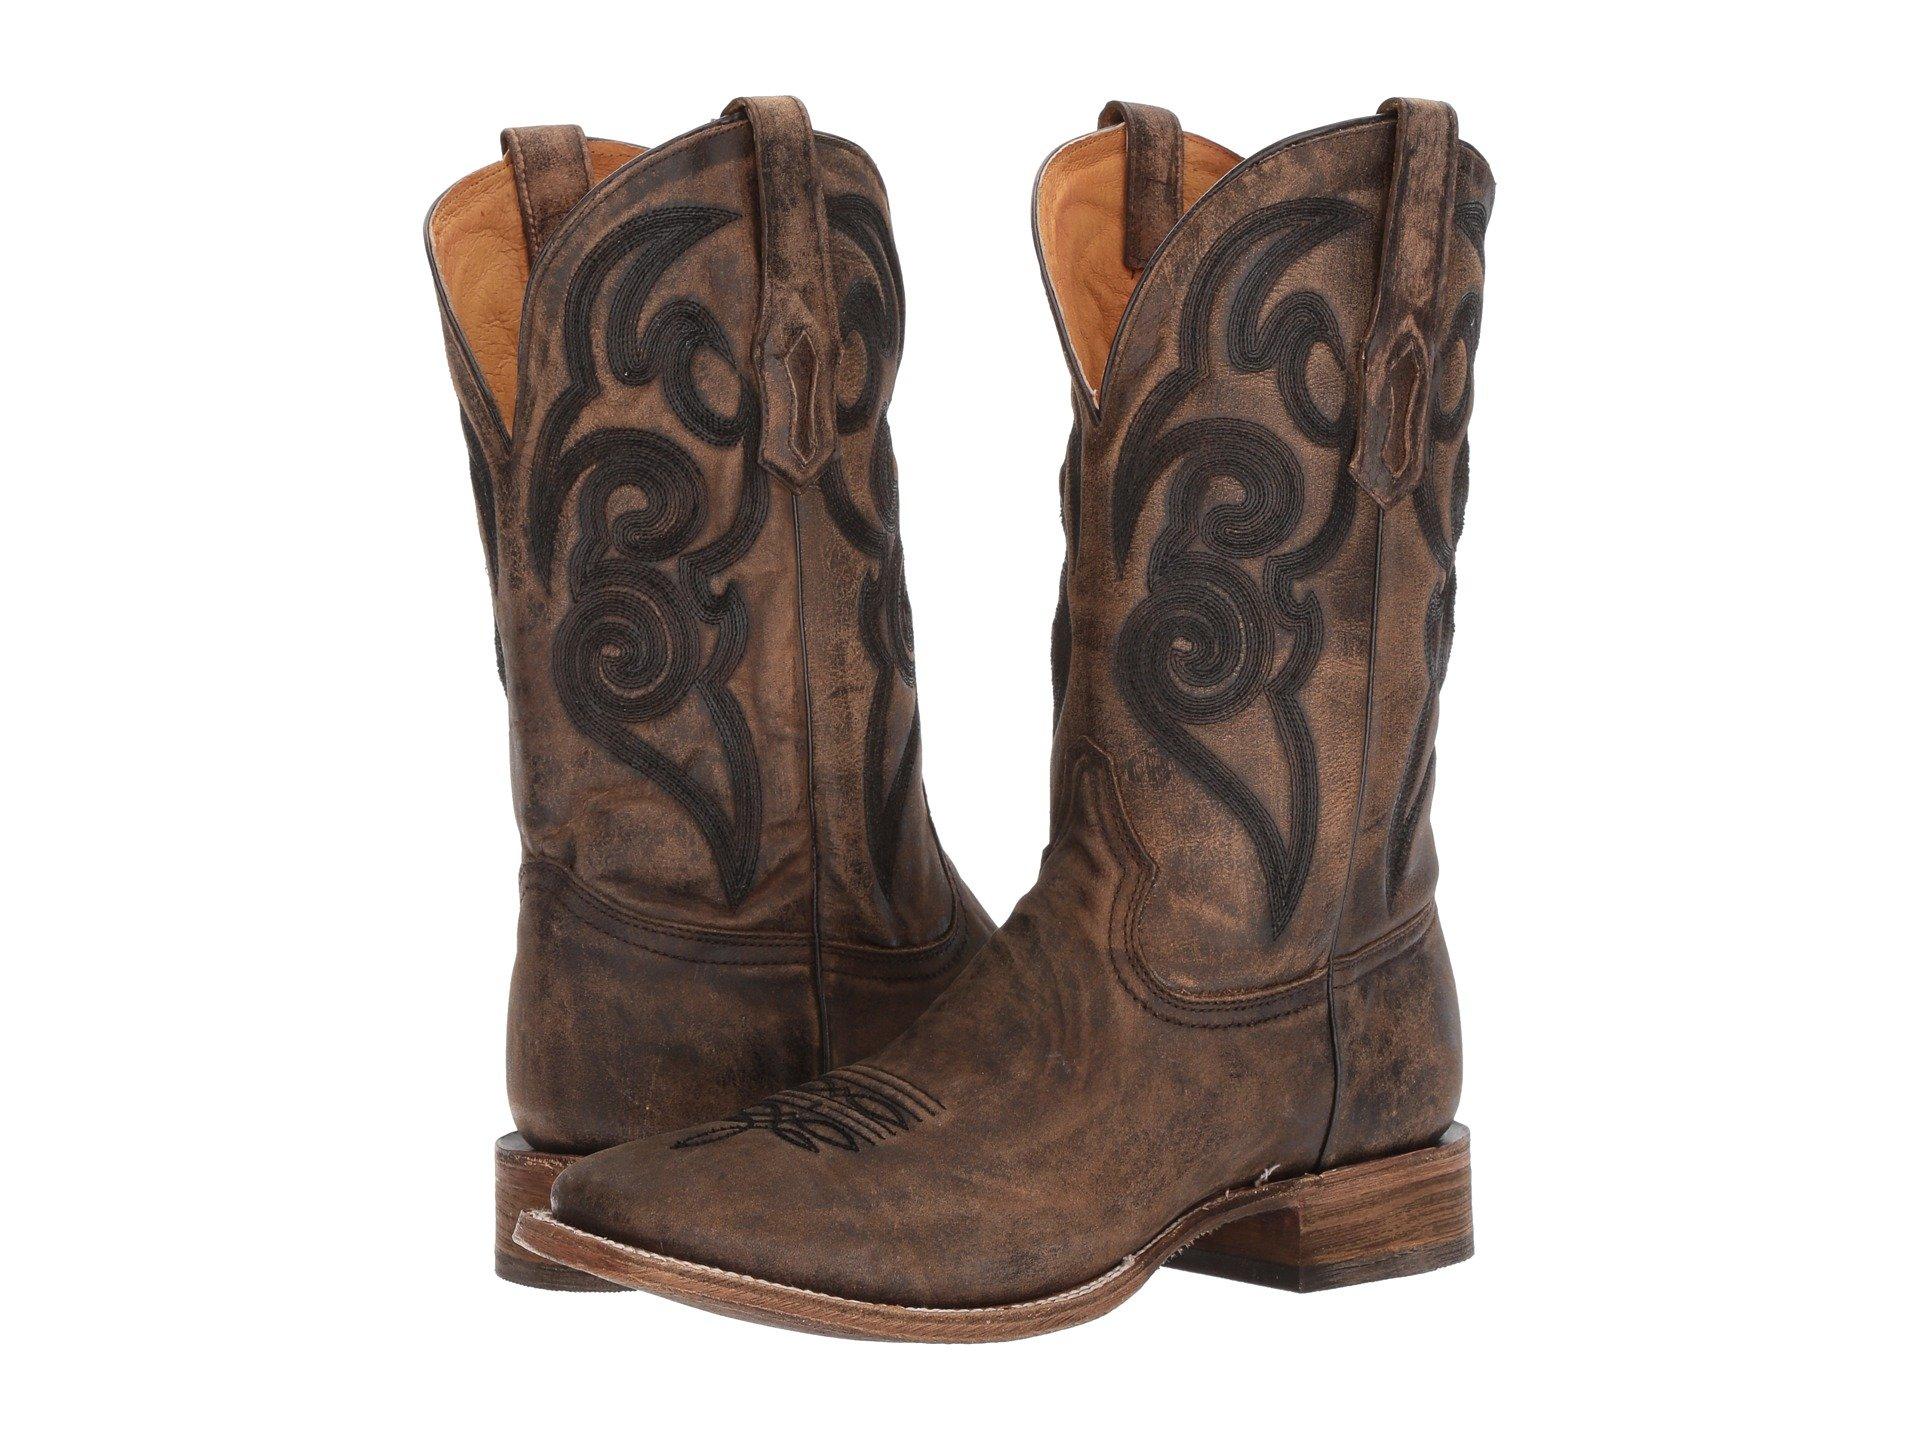 da7d0879ac9 Men's Corral Boots Cowboy Boots + FREE SHIPPING | Shoes | Zappos.com